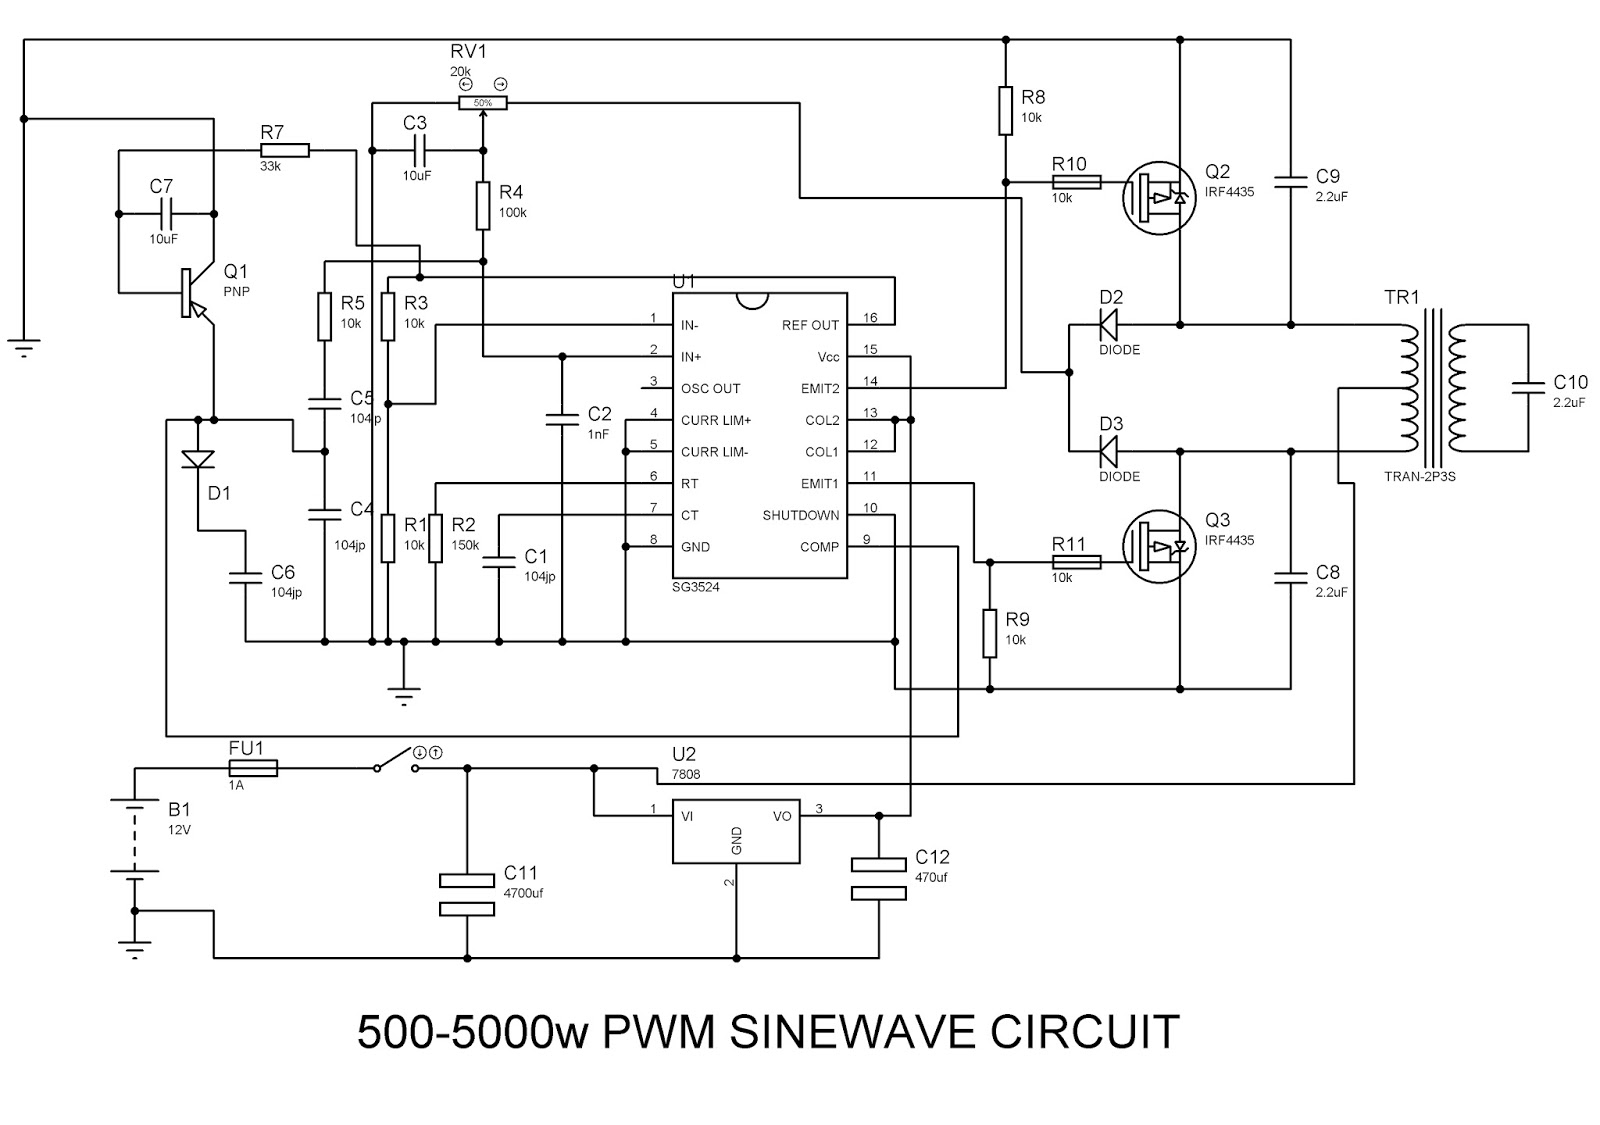 Sinewave Inverter Circuit SG3524(PWM)